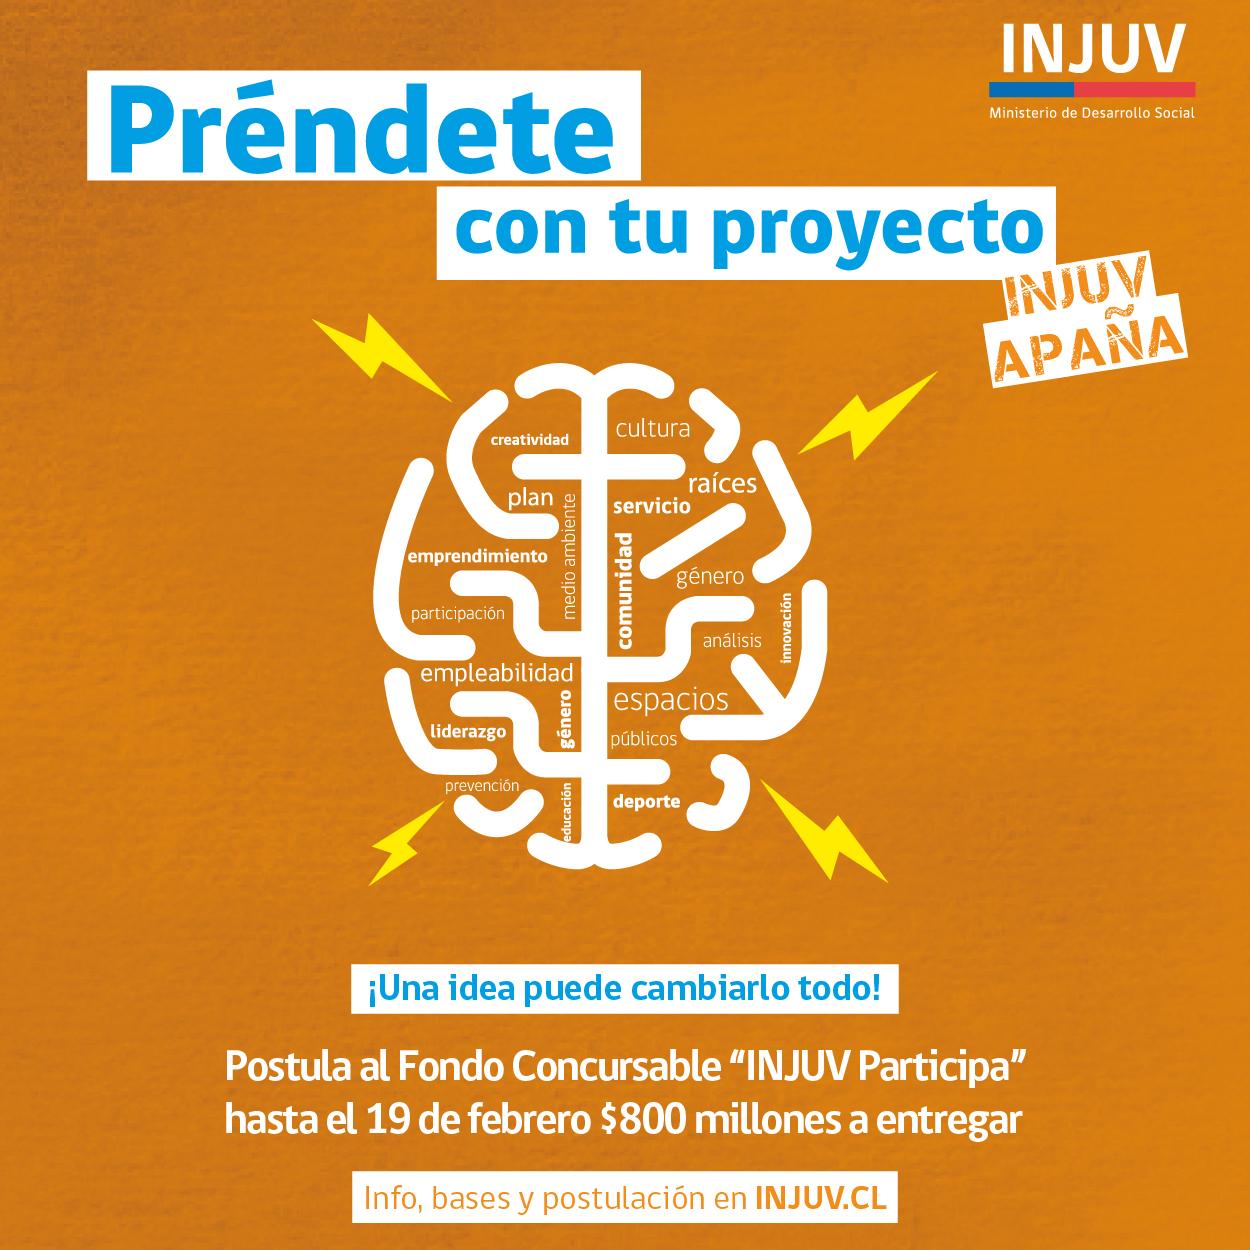 #Participa2017: INJUV lanza fondo concursable para financiar iniciativas juveniles